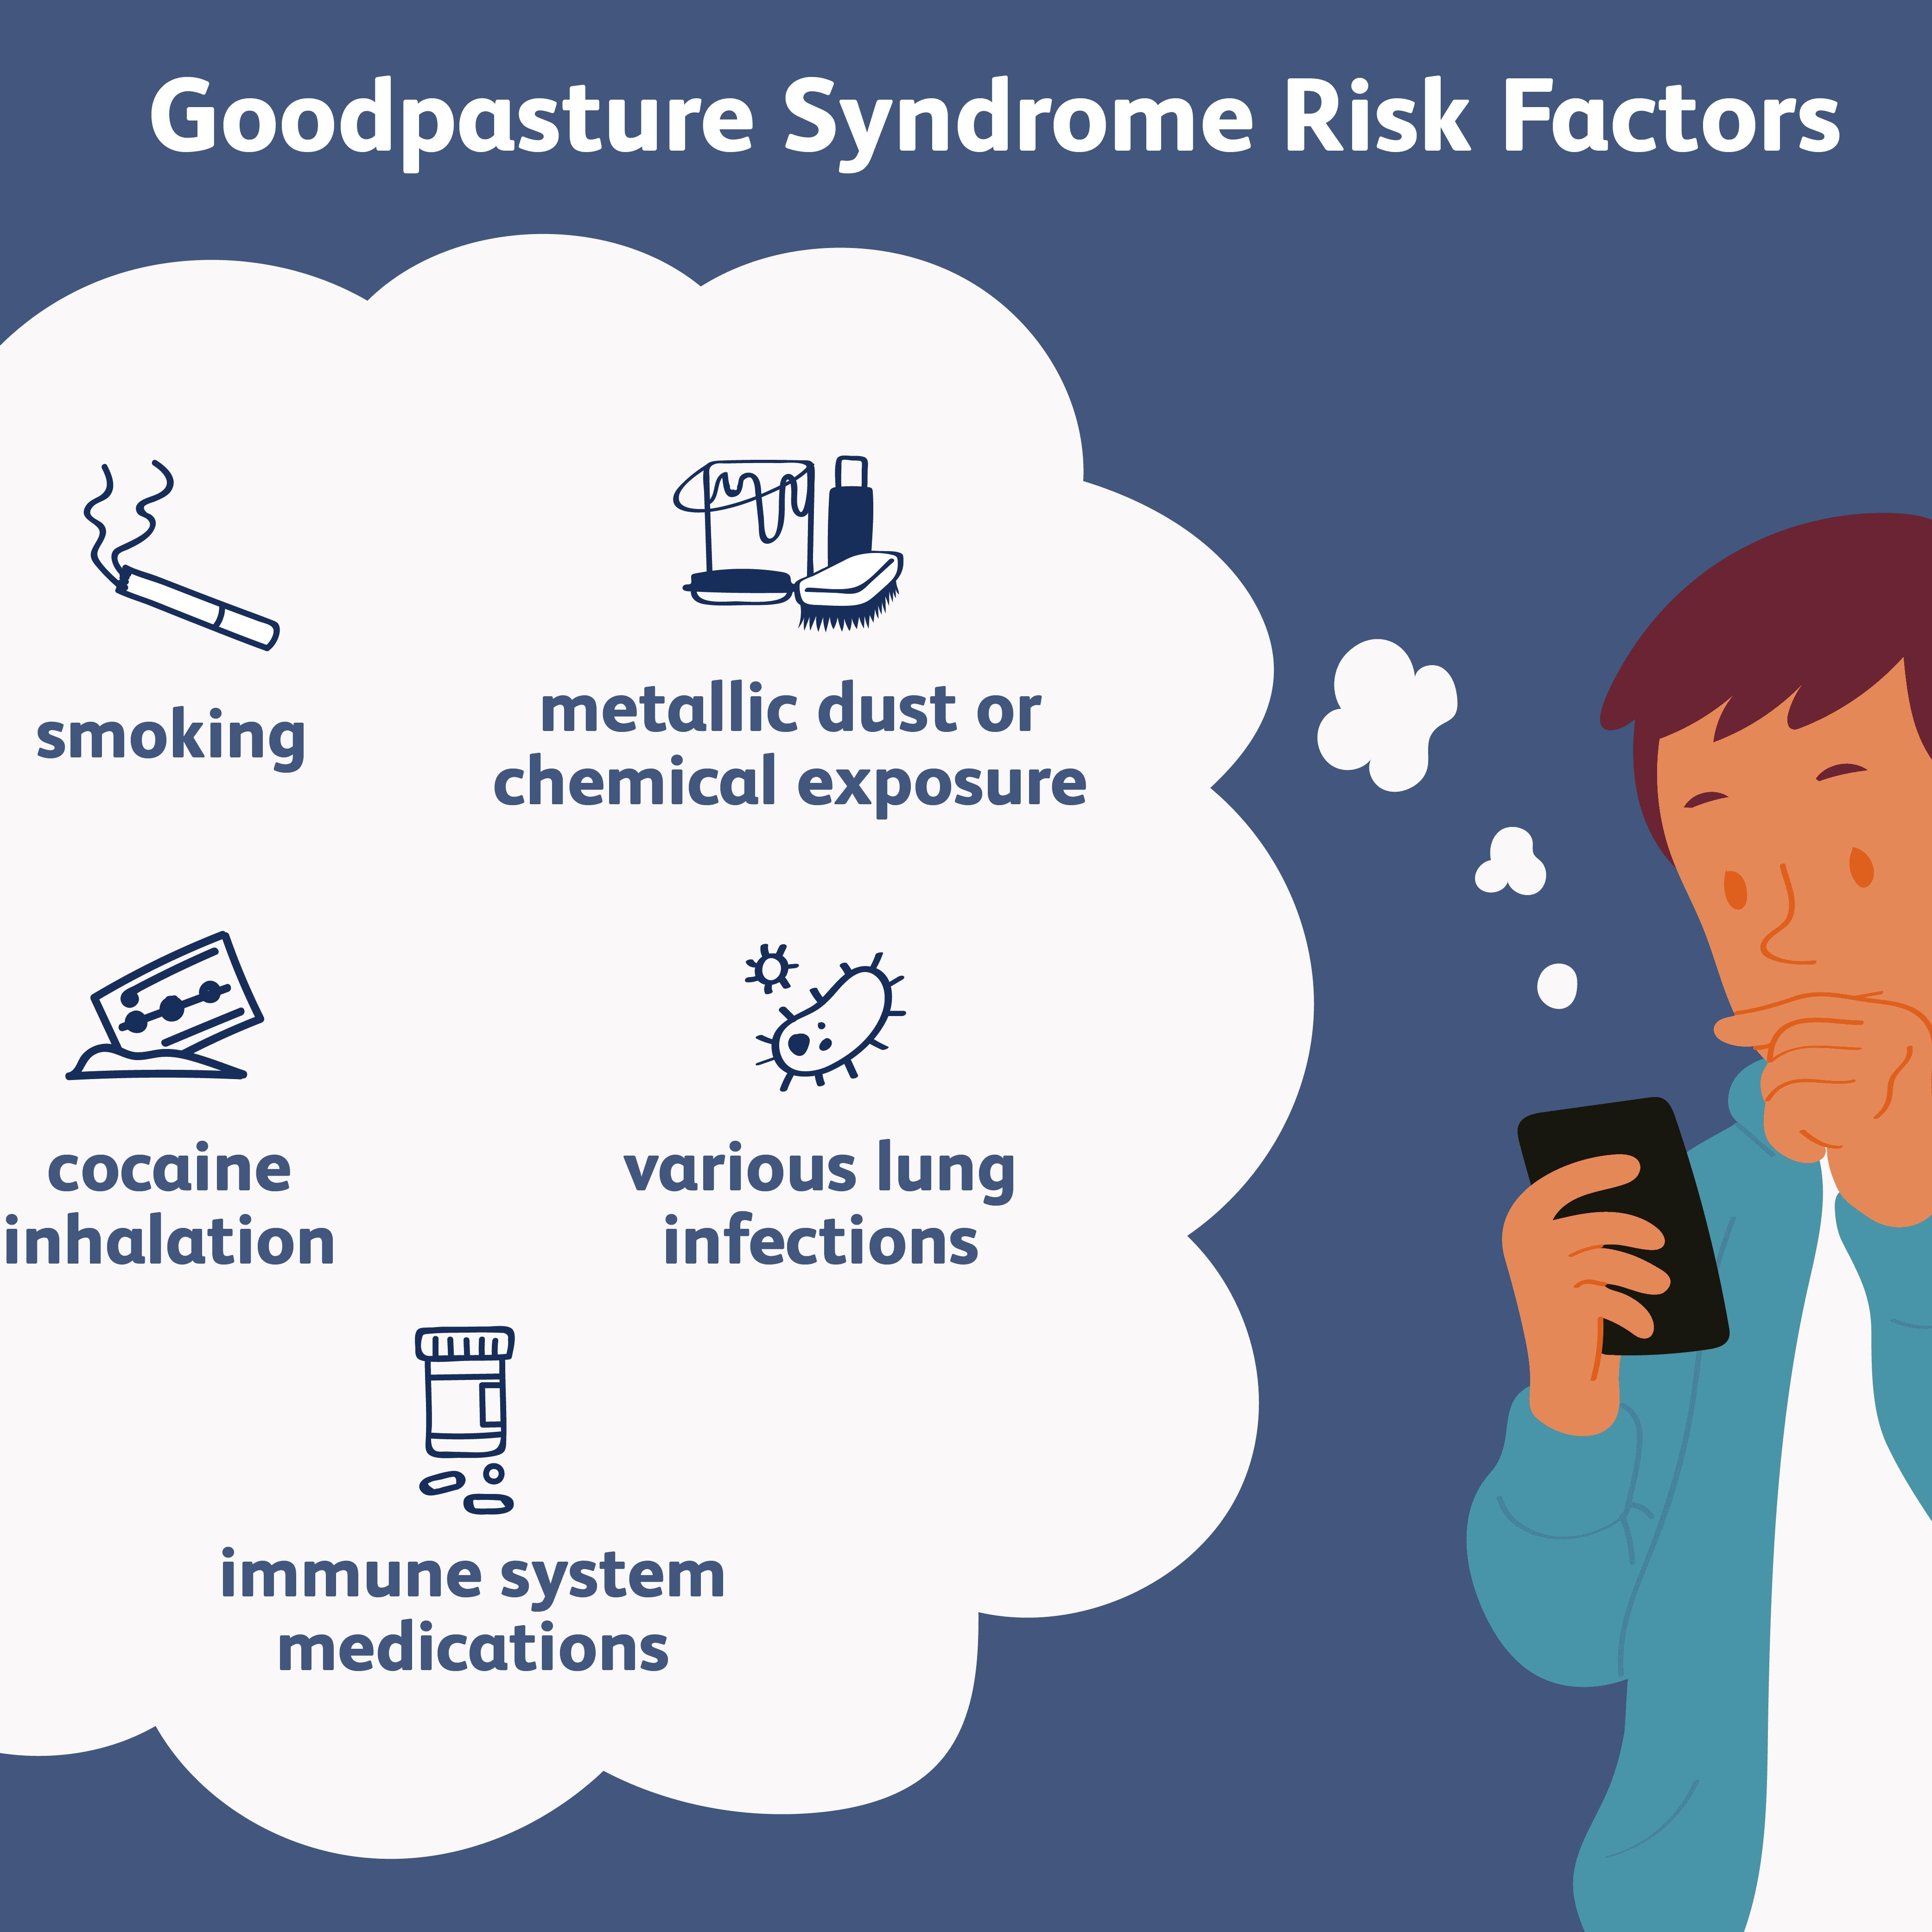 síndrome de goodpasture patología renal en diabetes